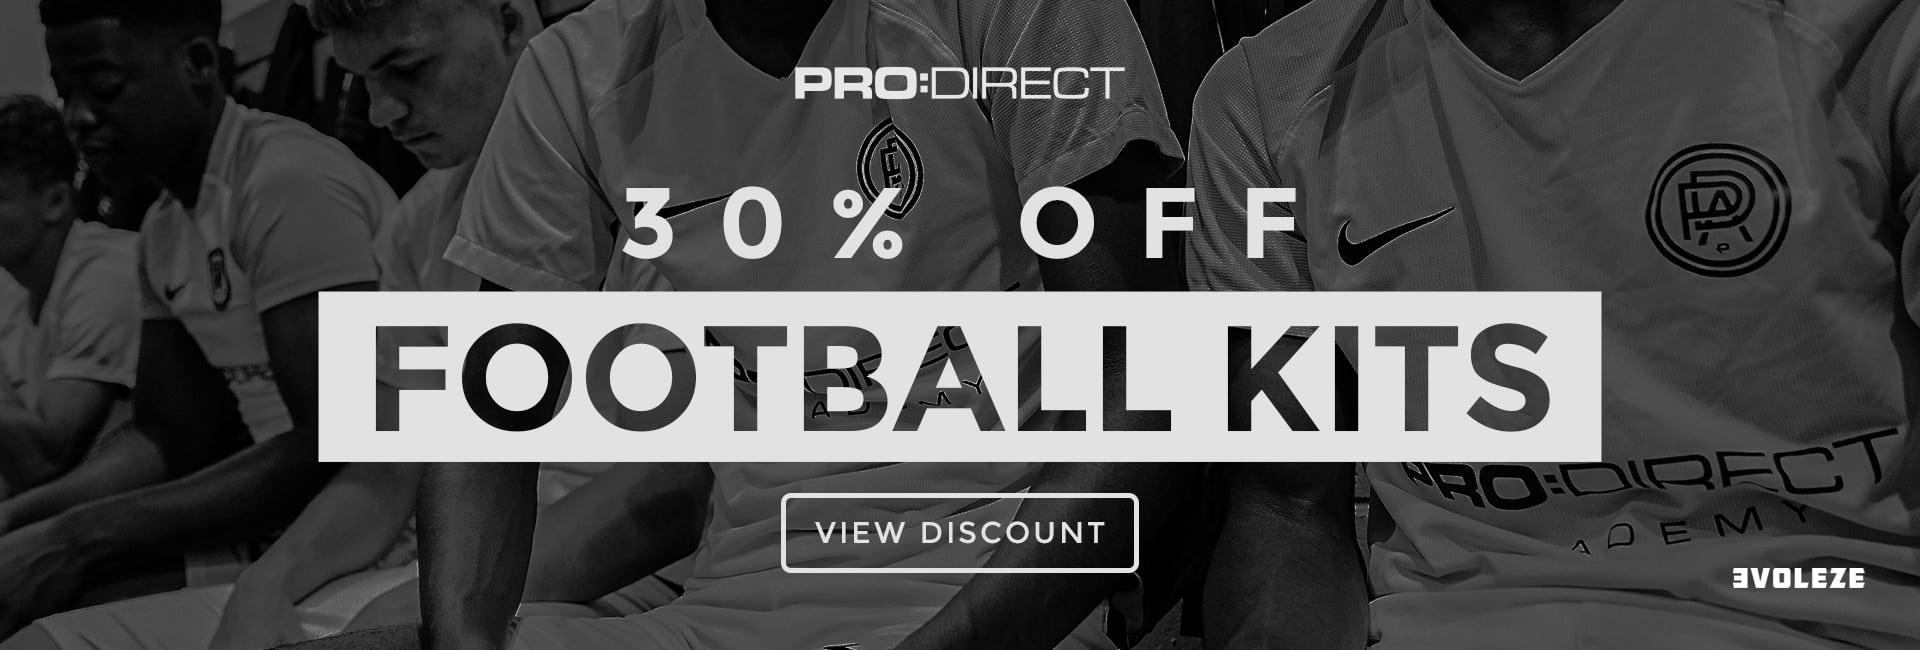 discount football kits